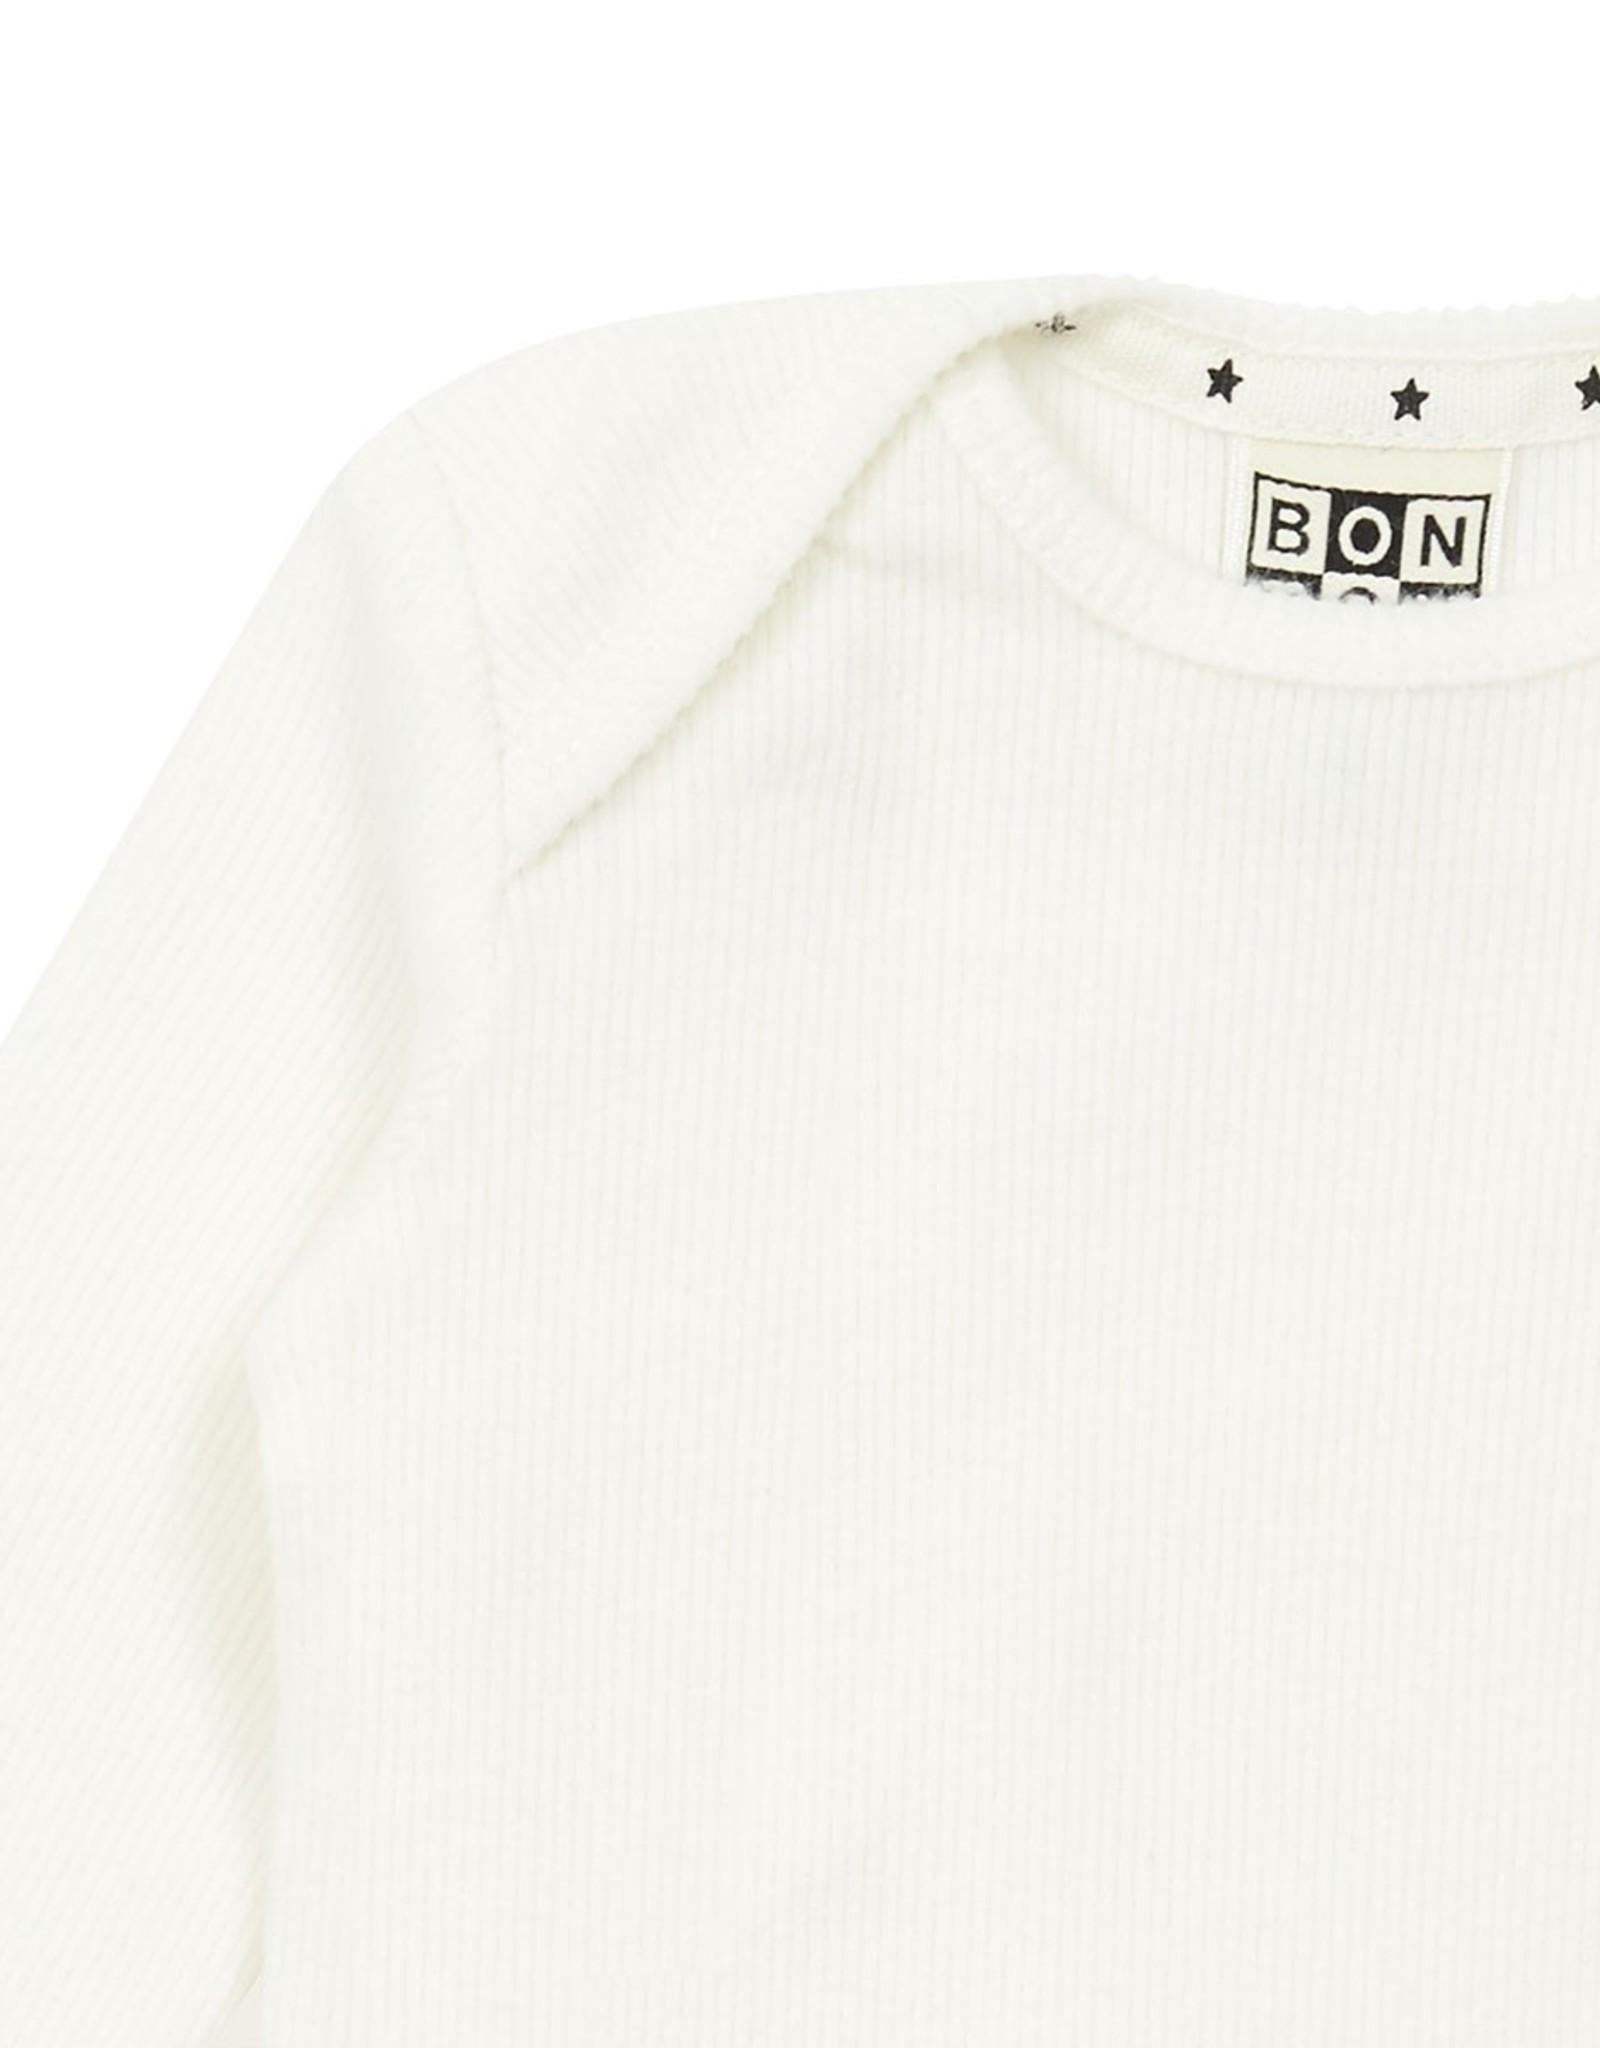 Bonton Sethome pajama set for baby